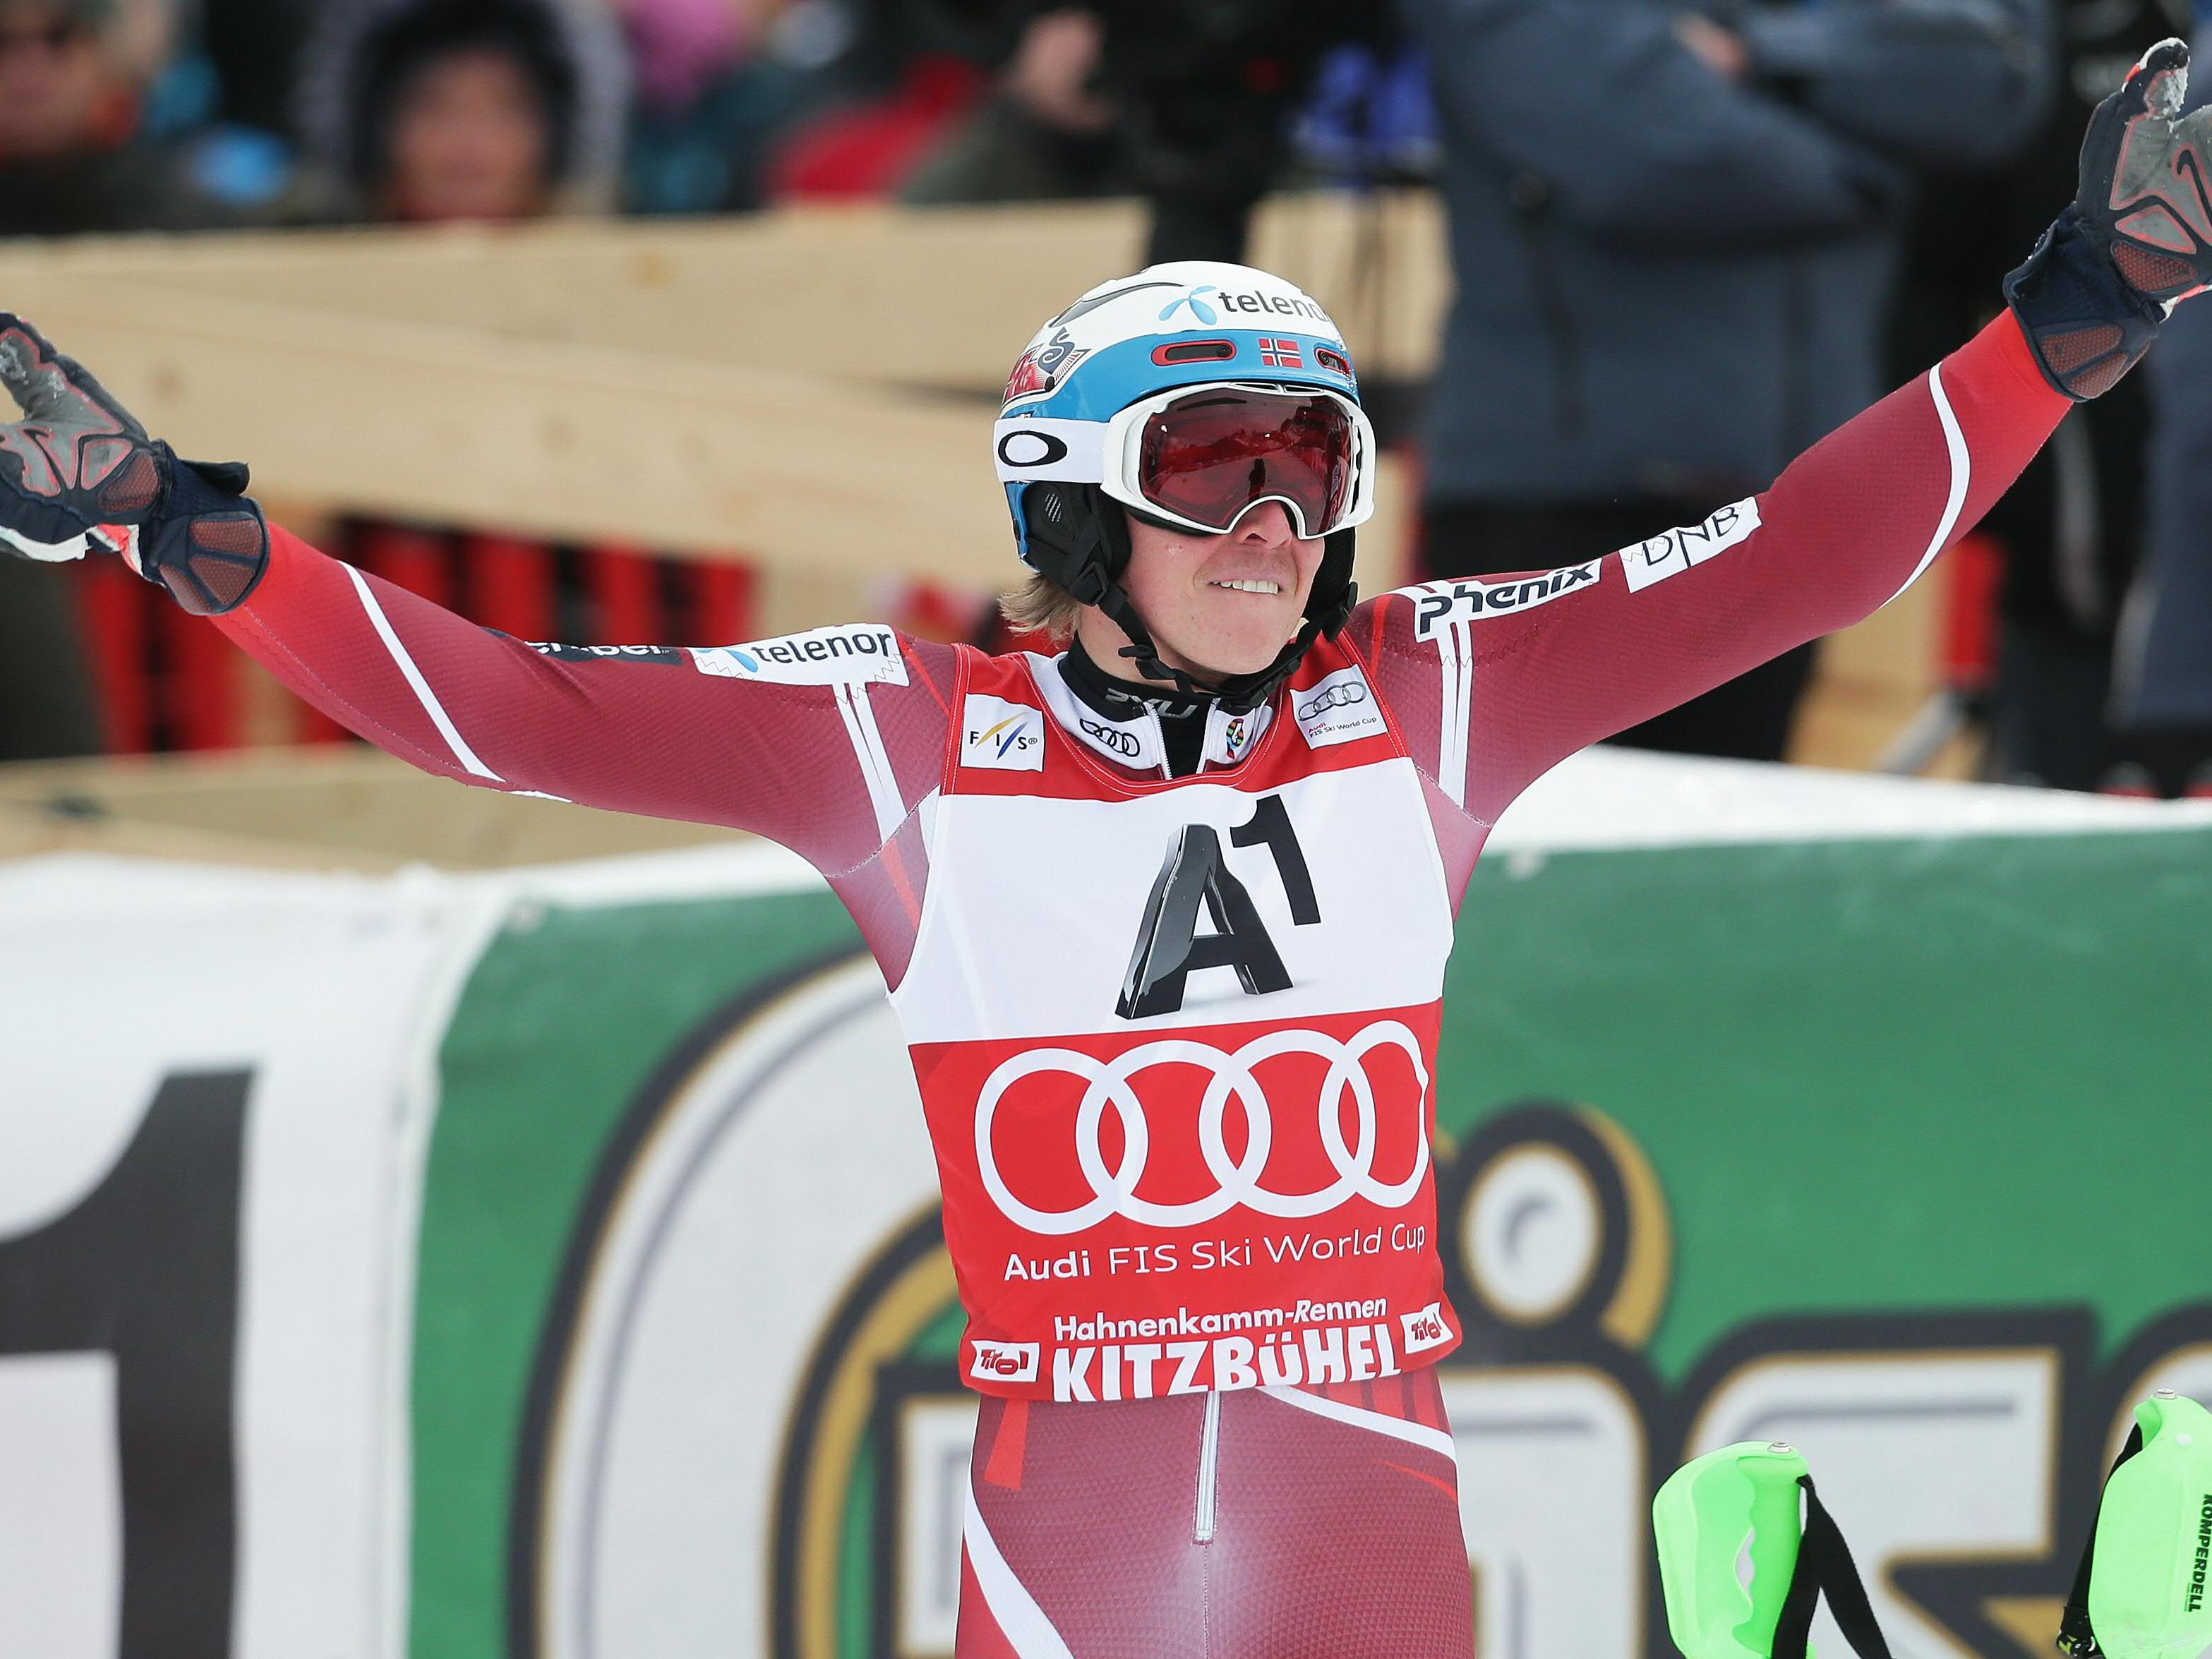 Norweger Kristoffersen triumphiert nach Aufholjagd im Kitzbühel-Slalom.